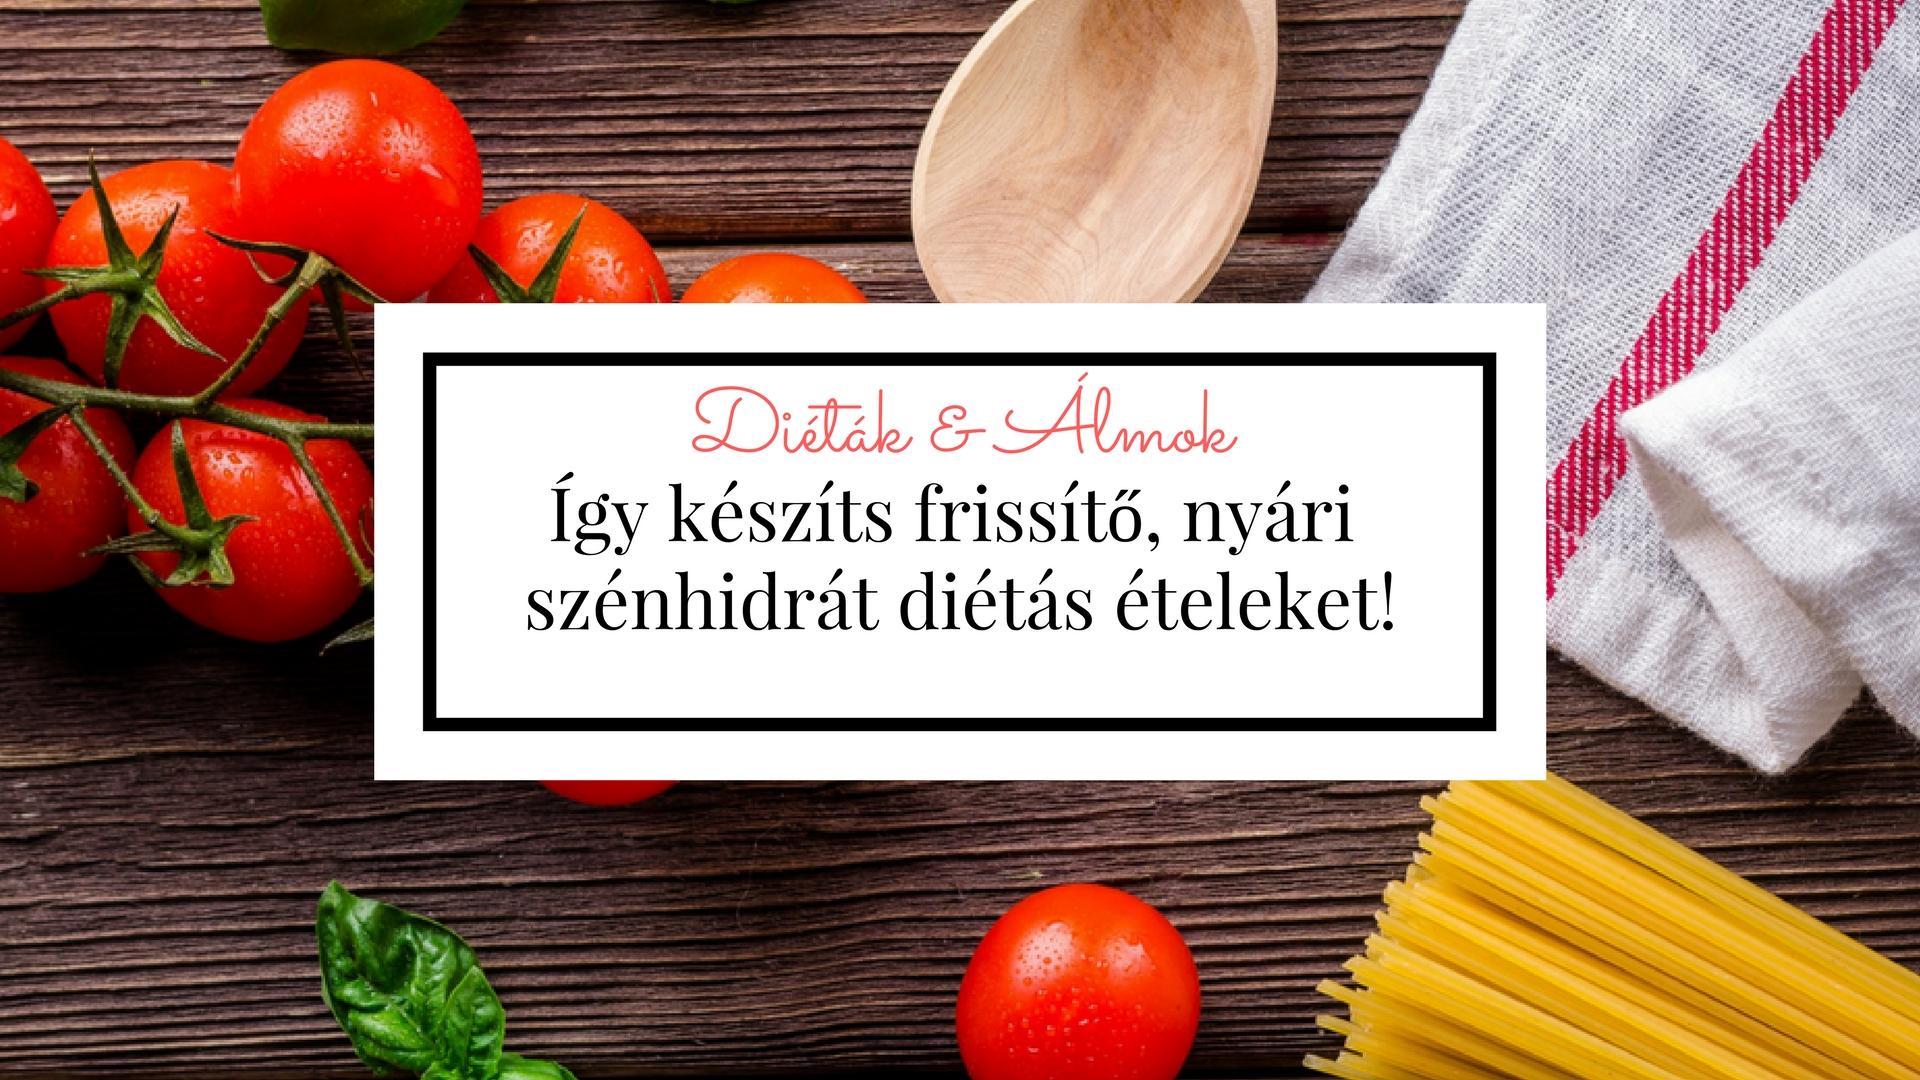 dietak_almok_nyari_szenhidrat_dieta_tanfolyam_2.jpg